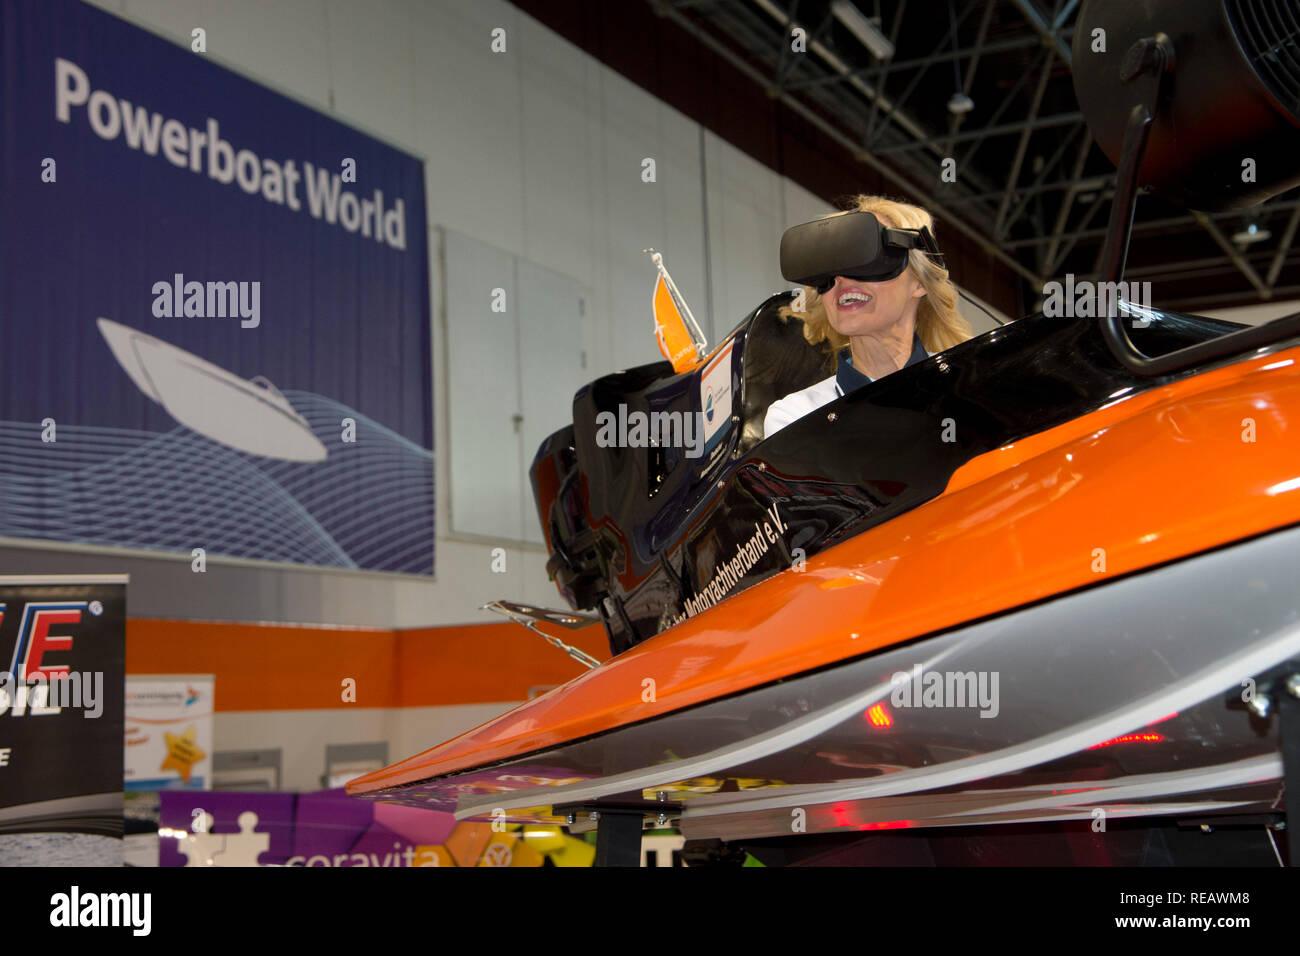 The boat model Jana tests the virtual racing boat simulator of the